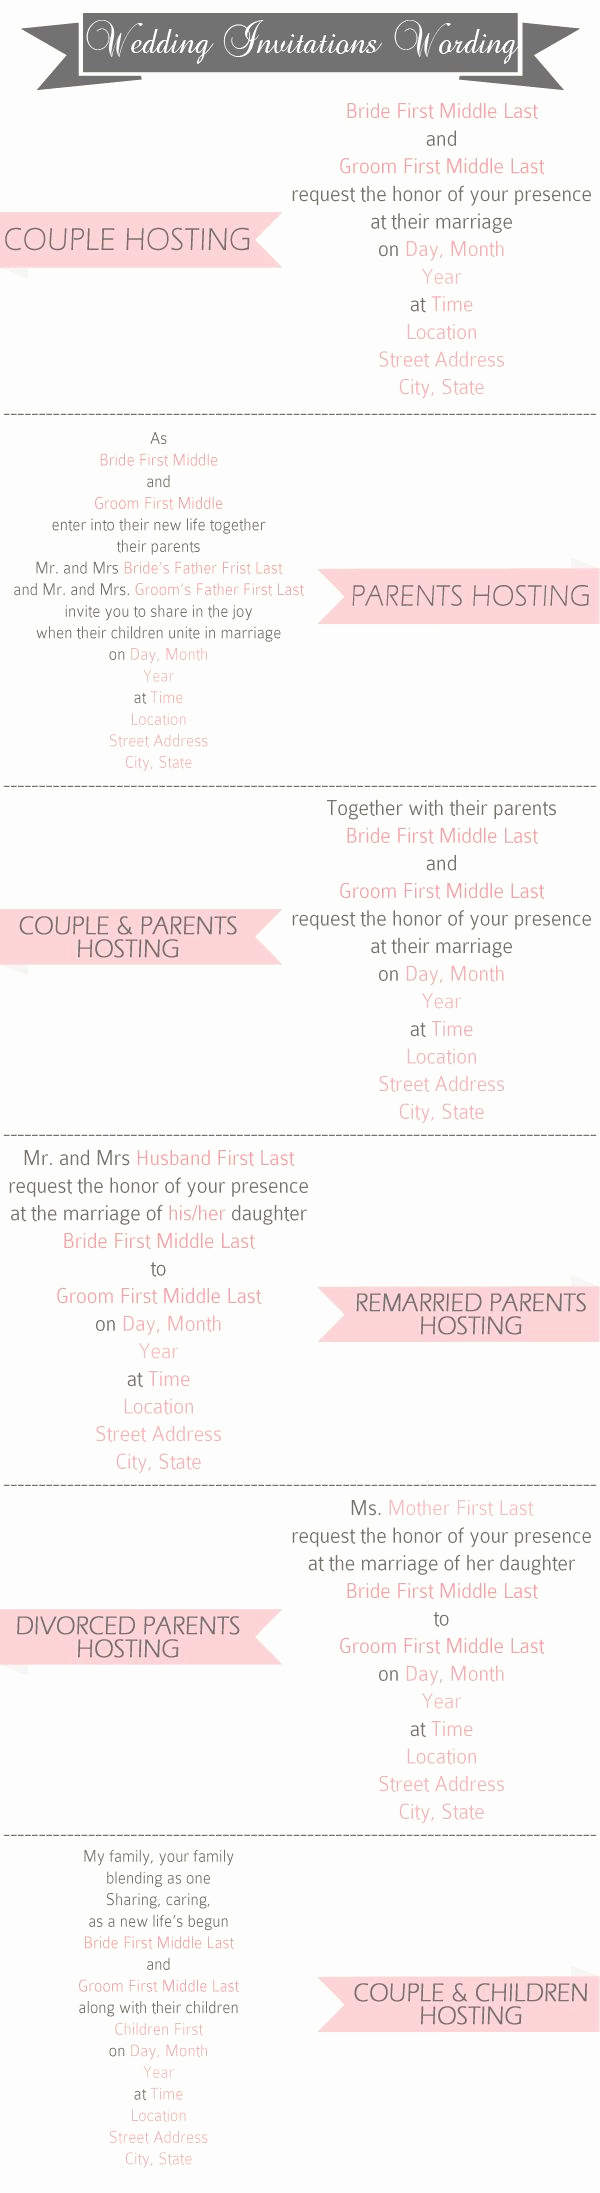 Wedding Invitation Wording Couple Hosting New Wedding Invitation Wording Samples to Invite Guests